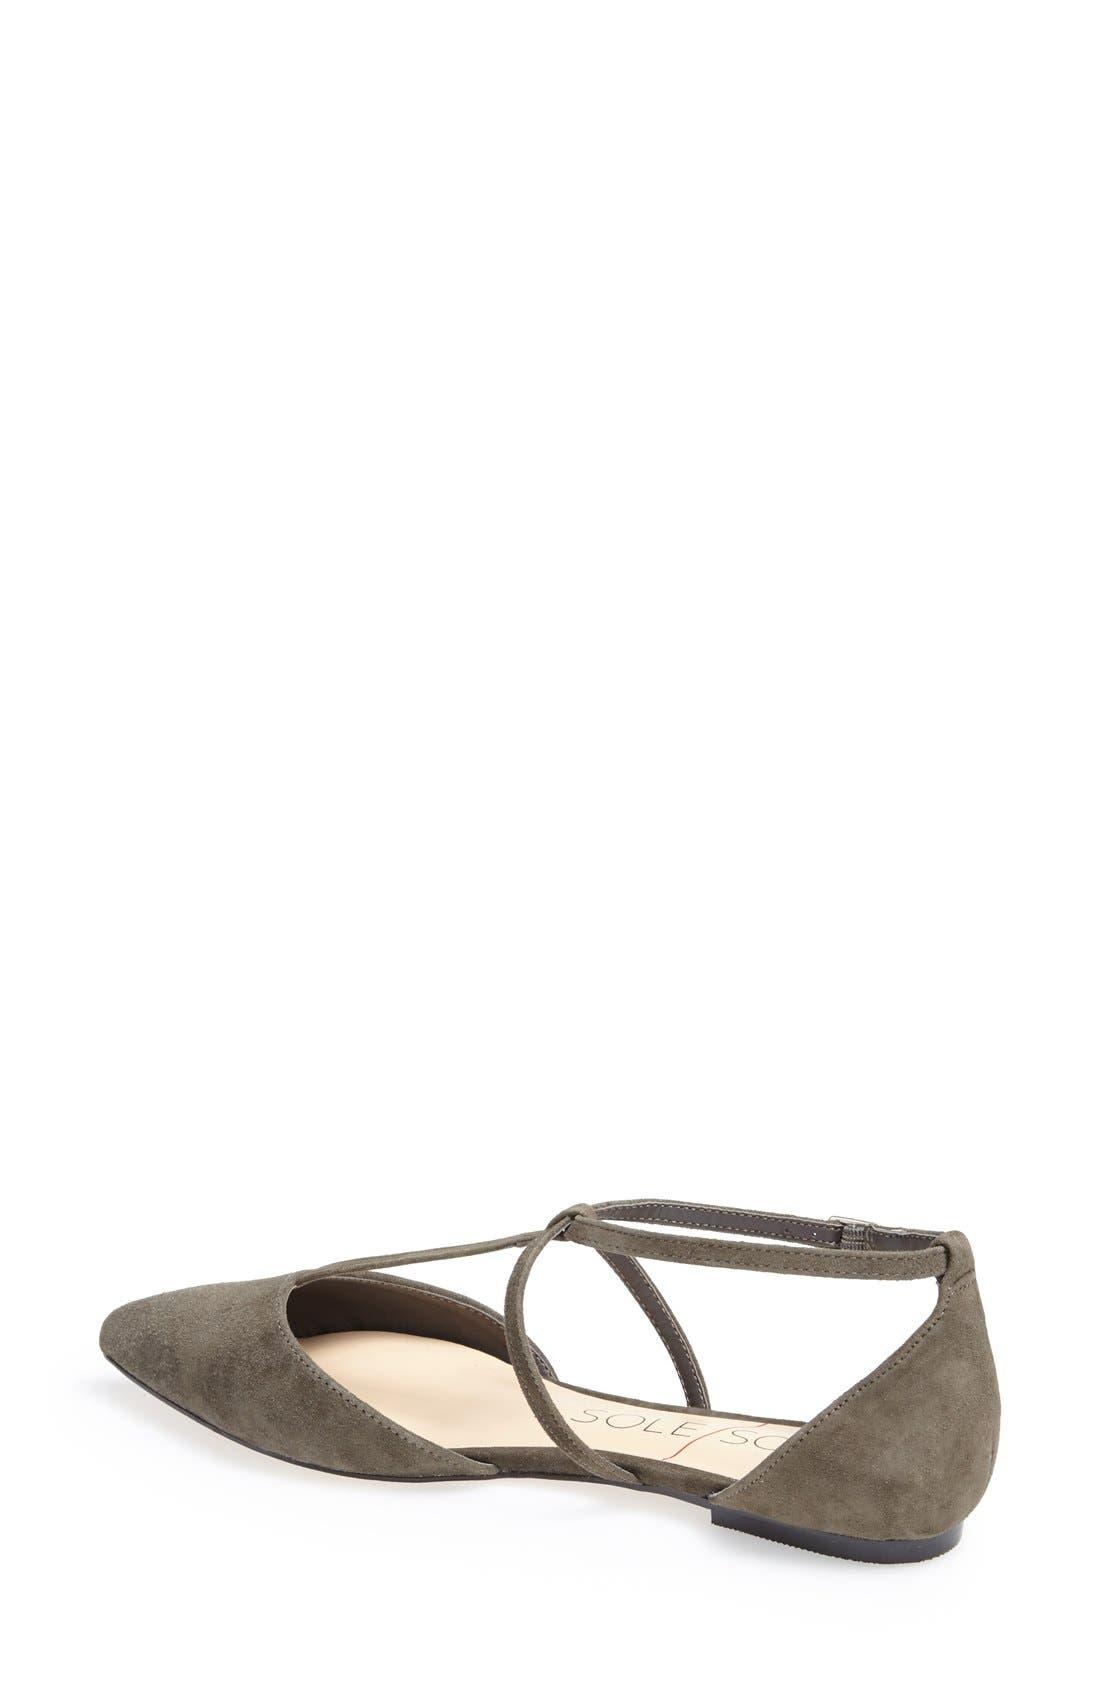 Alternate Image 2  - Sole Society 'Chandler' Pointy Toe Flat (Women)